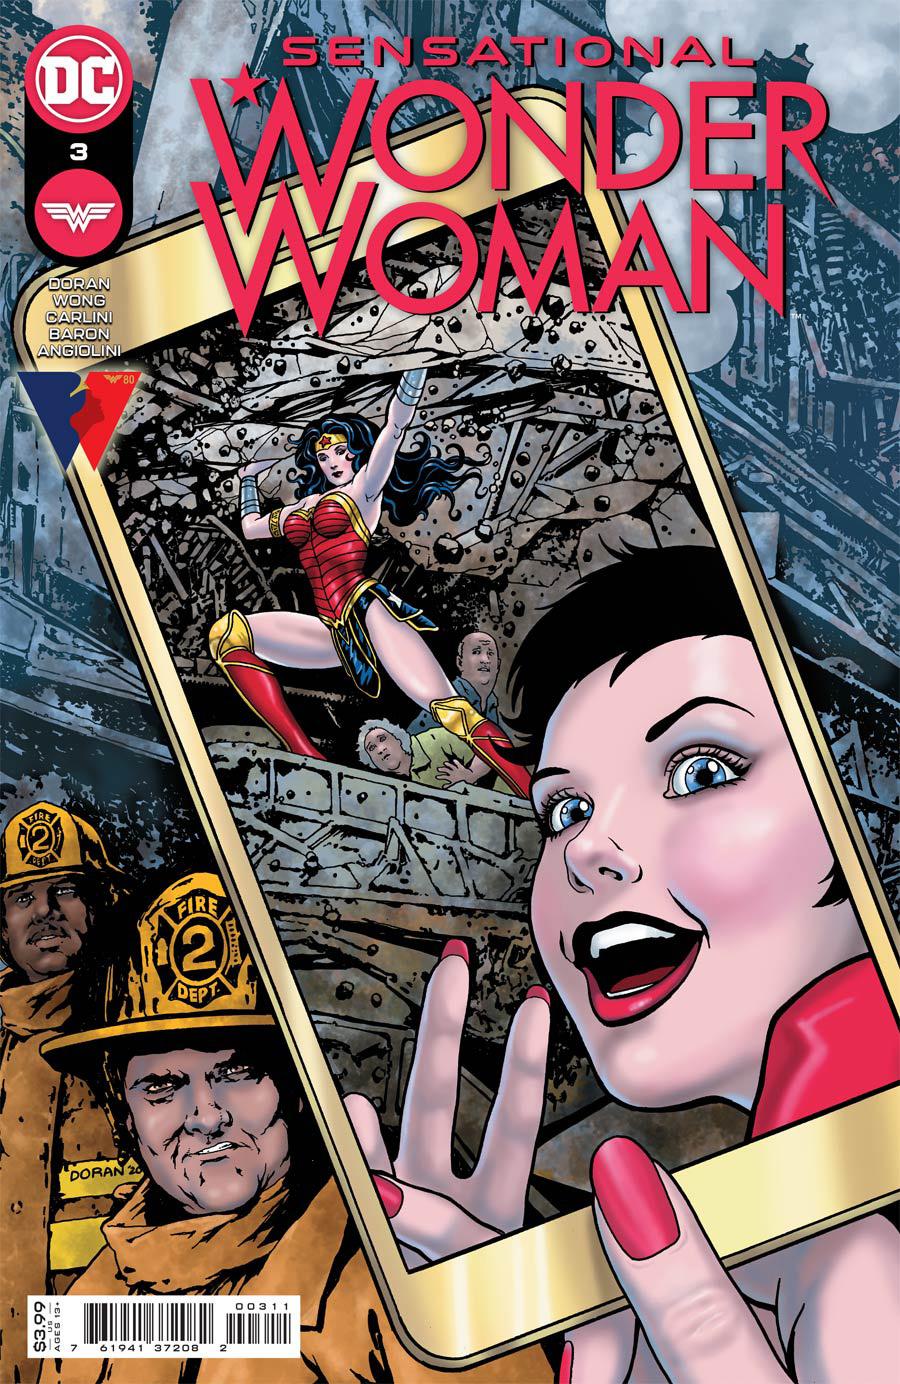 Sensational Wonder Woman #3 Cover A Regular Colleen Doran Cover